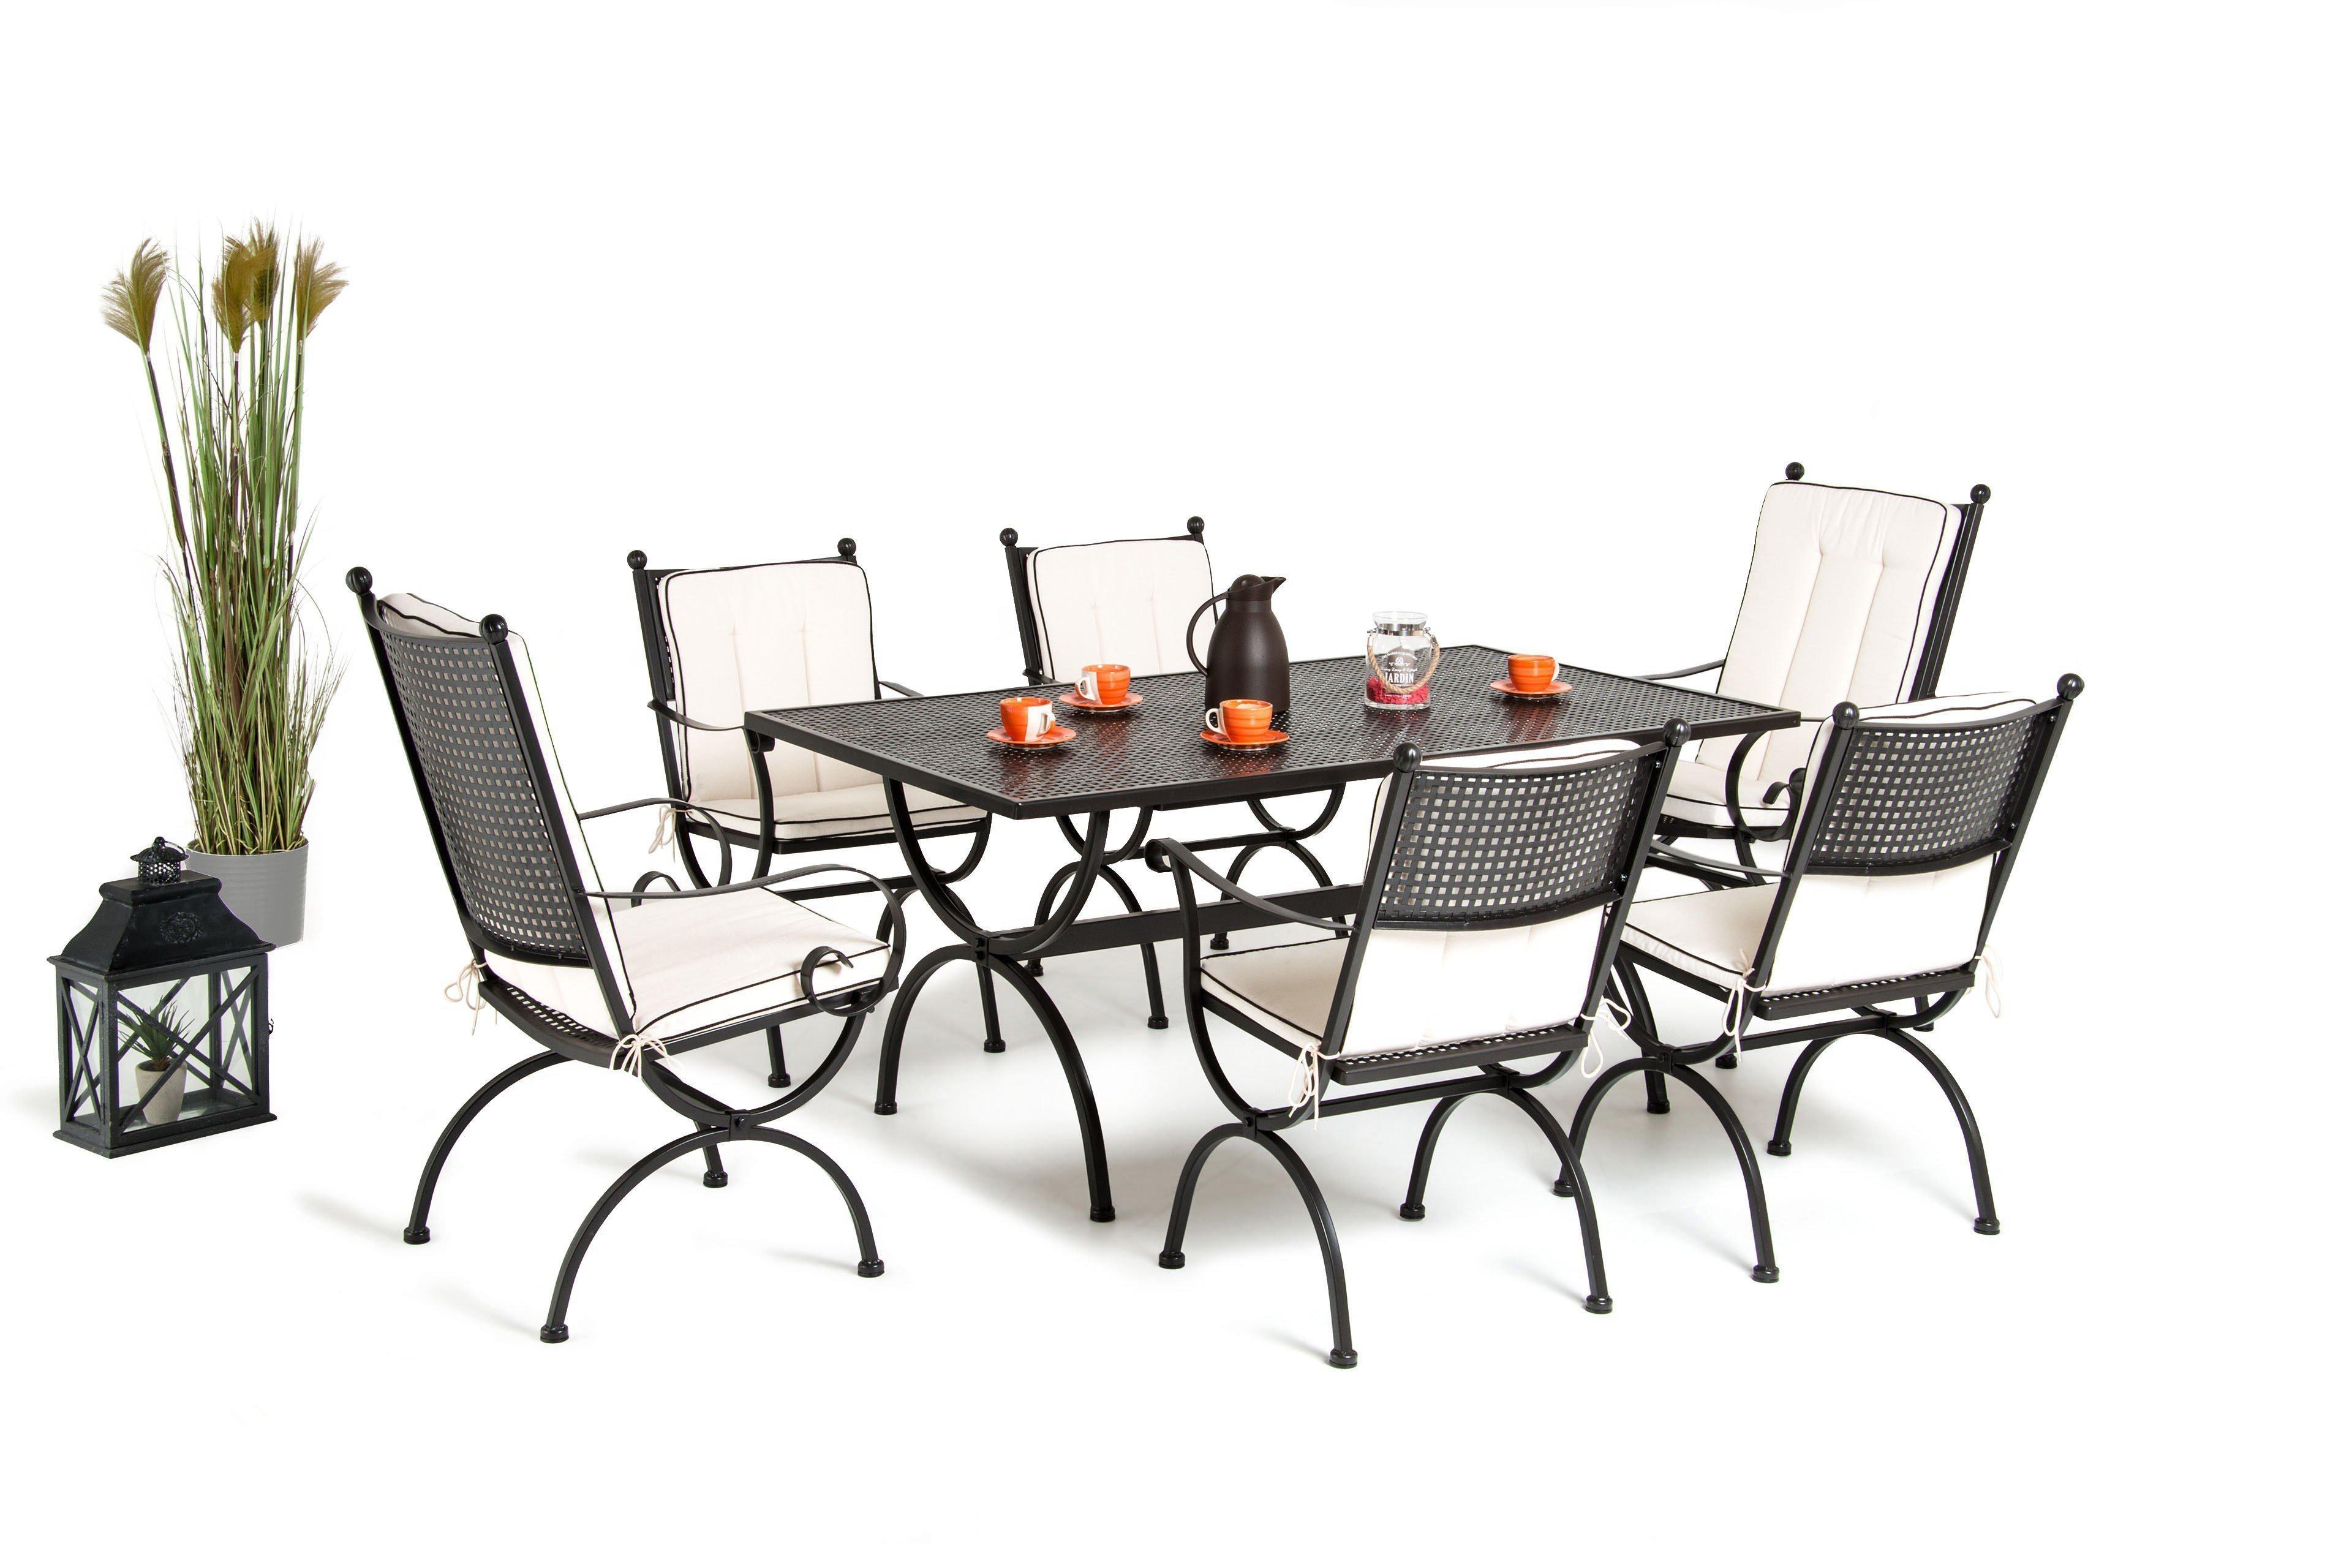 mbm sessel elegance romeo schmiedeeisen m bel letz ihr online shop. Black Bedroom Furniture Sets. Home Design Ideas